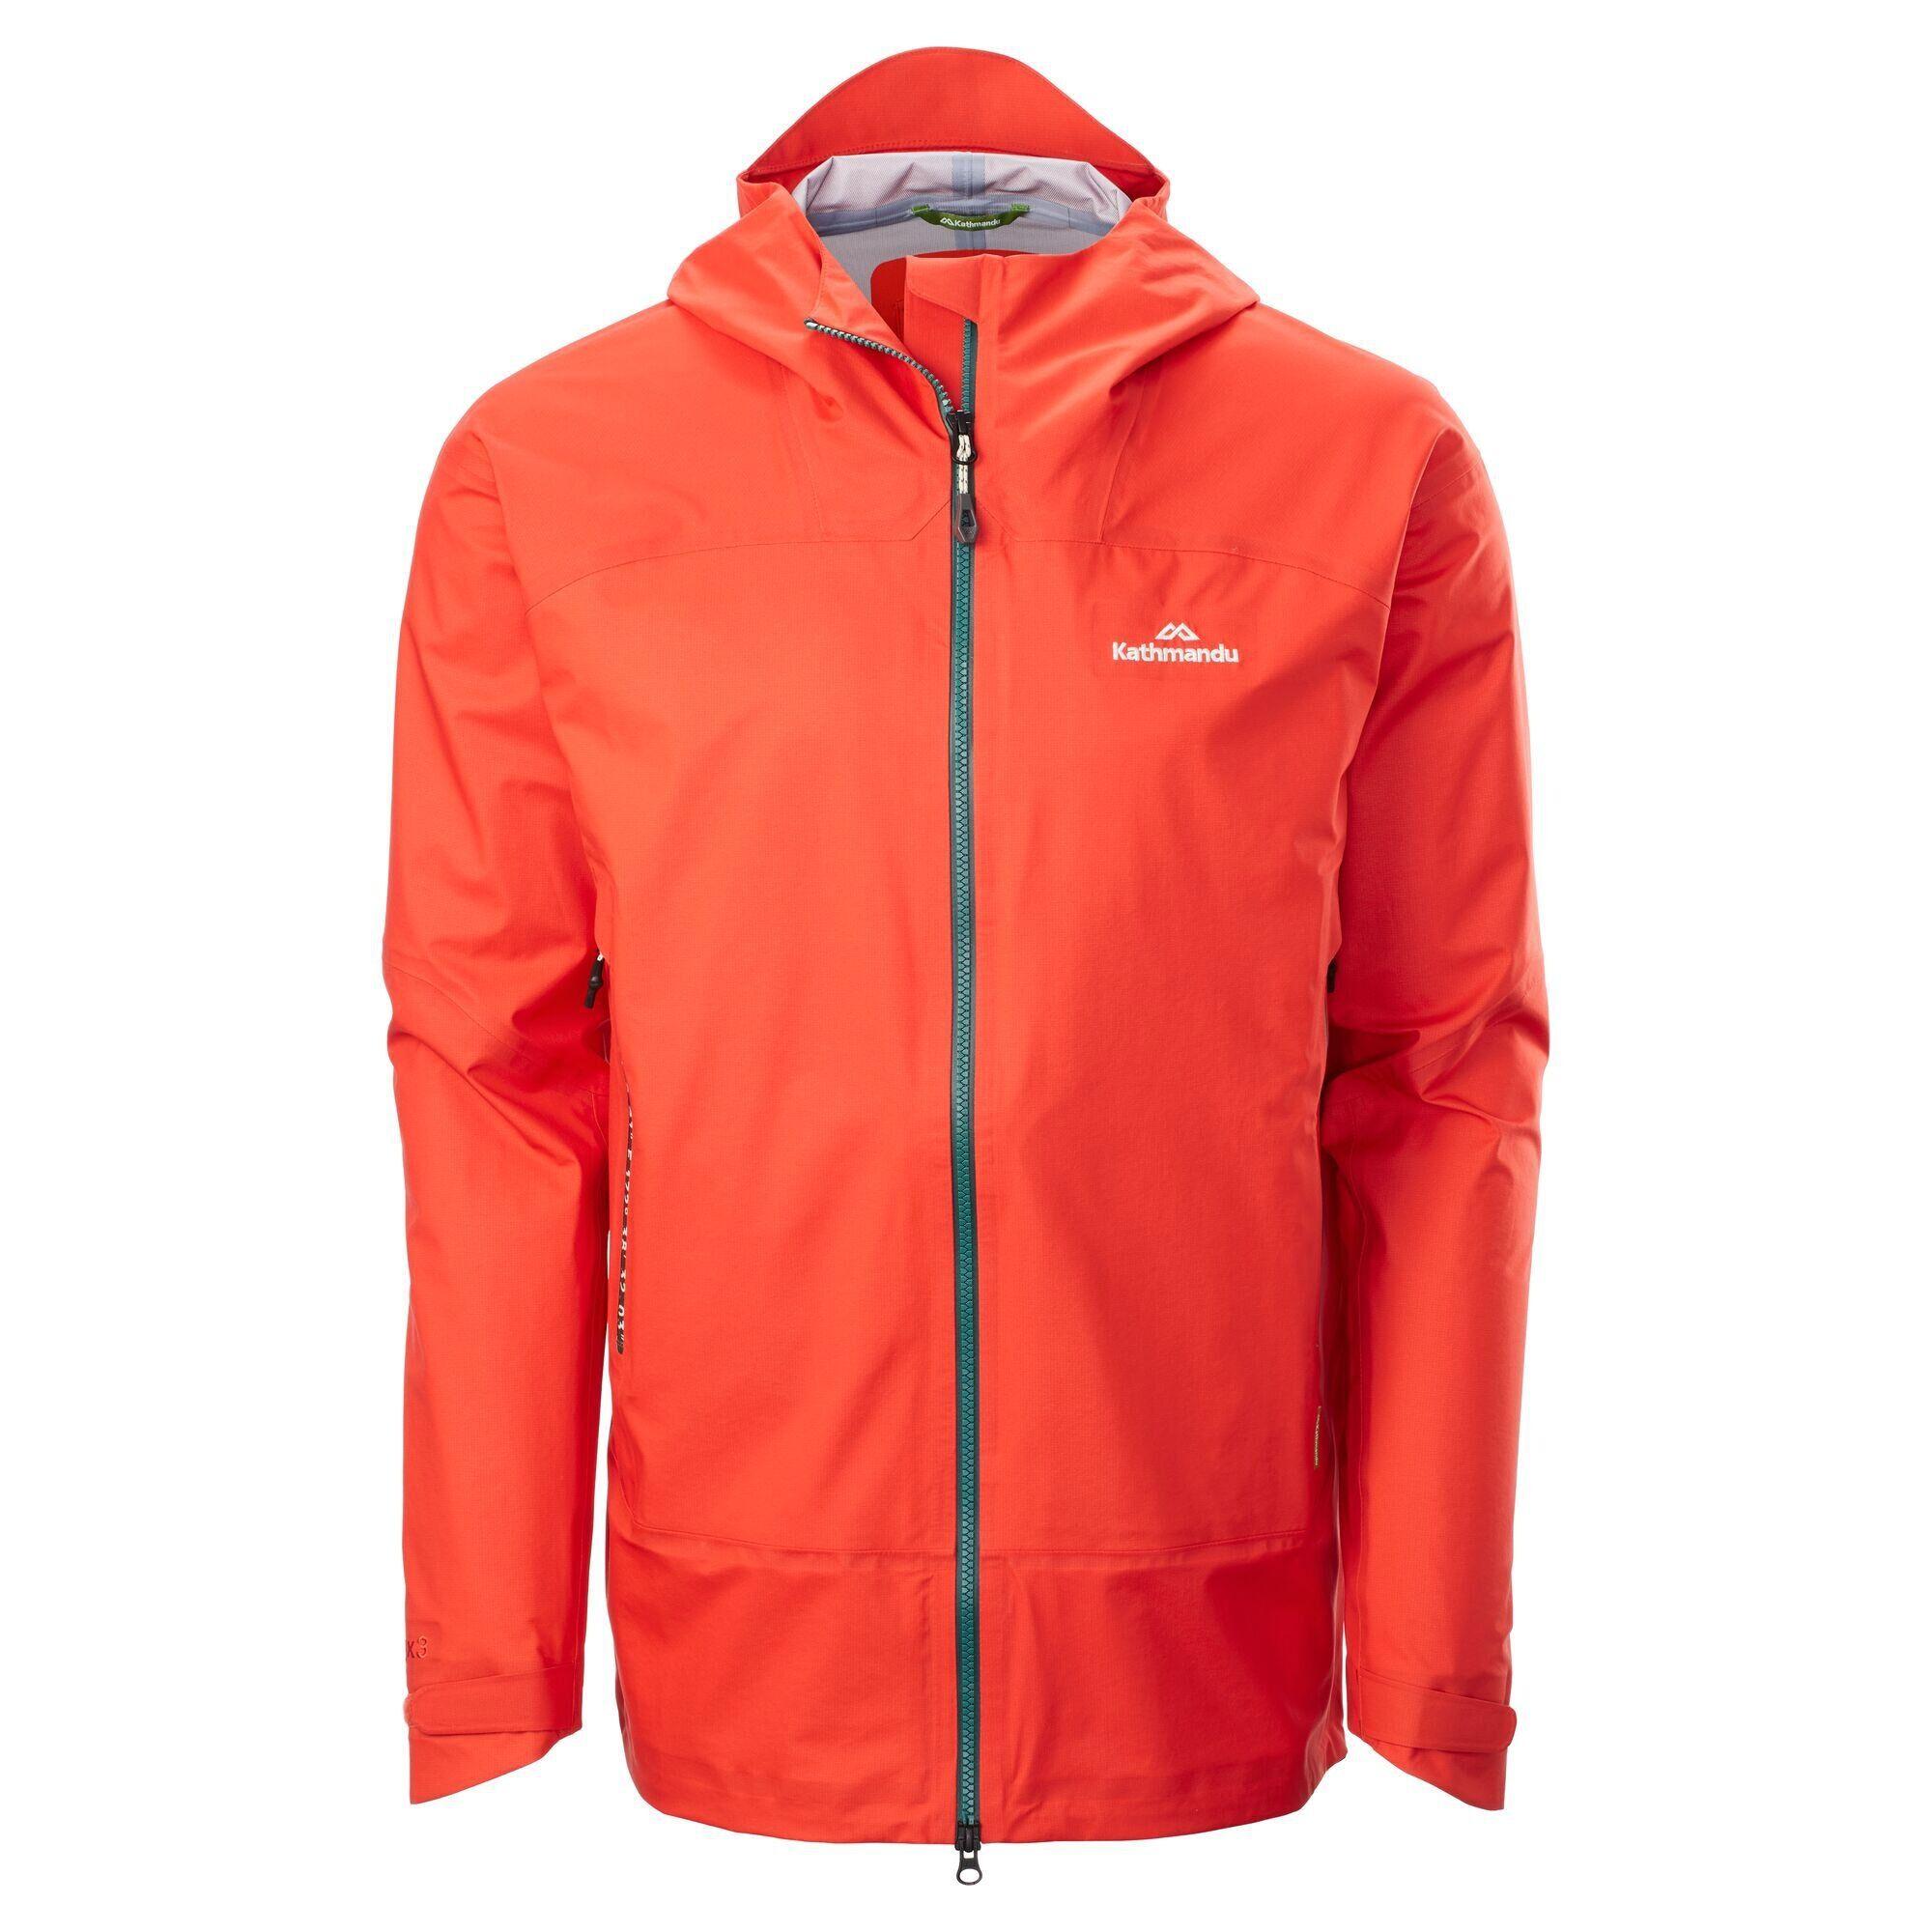 Kathmandu Flinders Men's Rain Jacket  - Fiesta - Size: 2X-Large